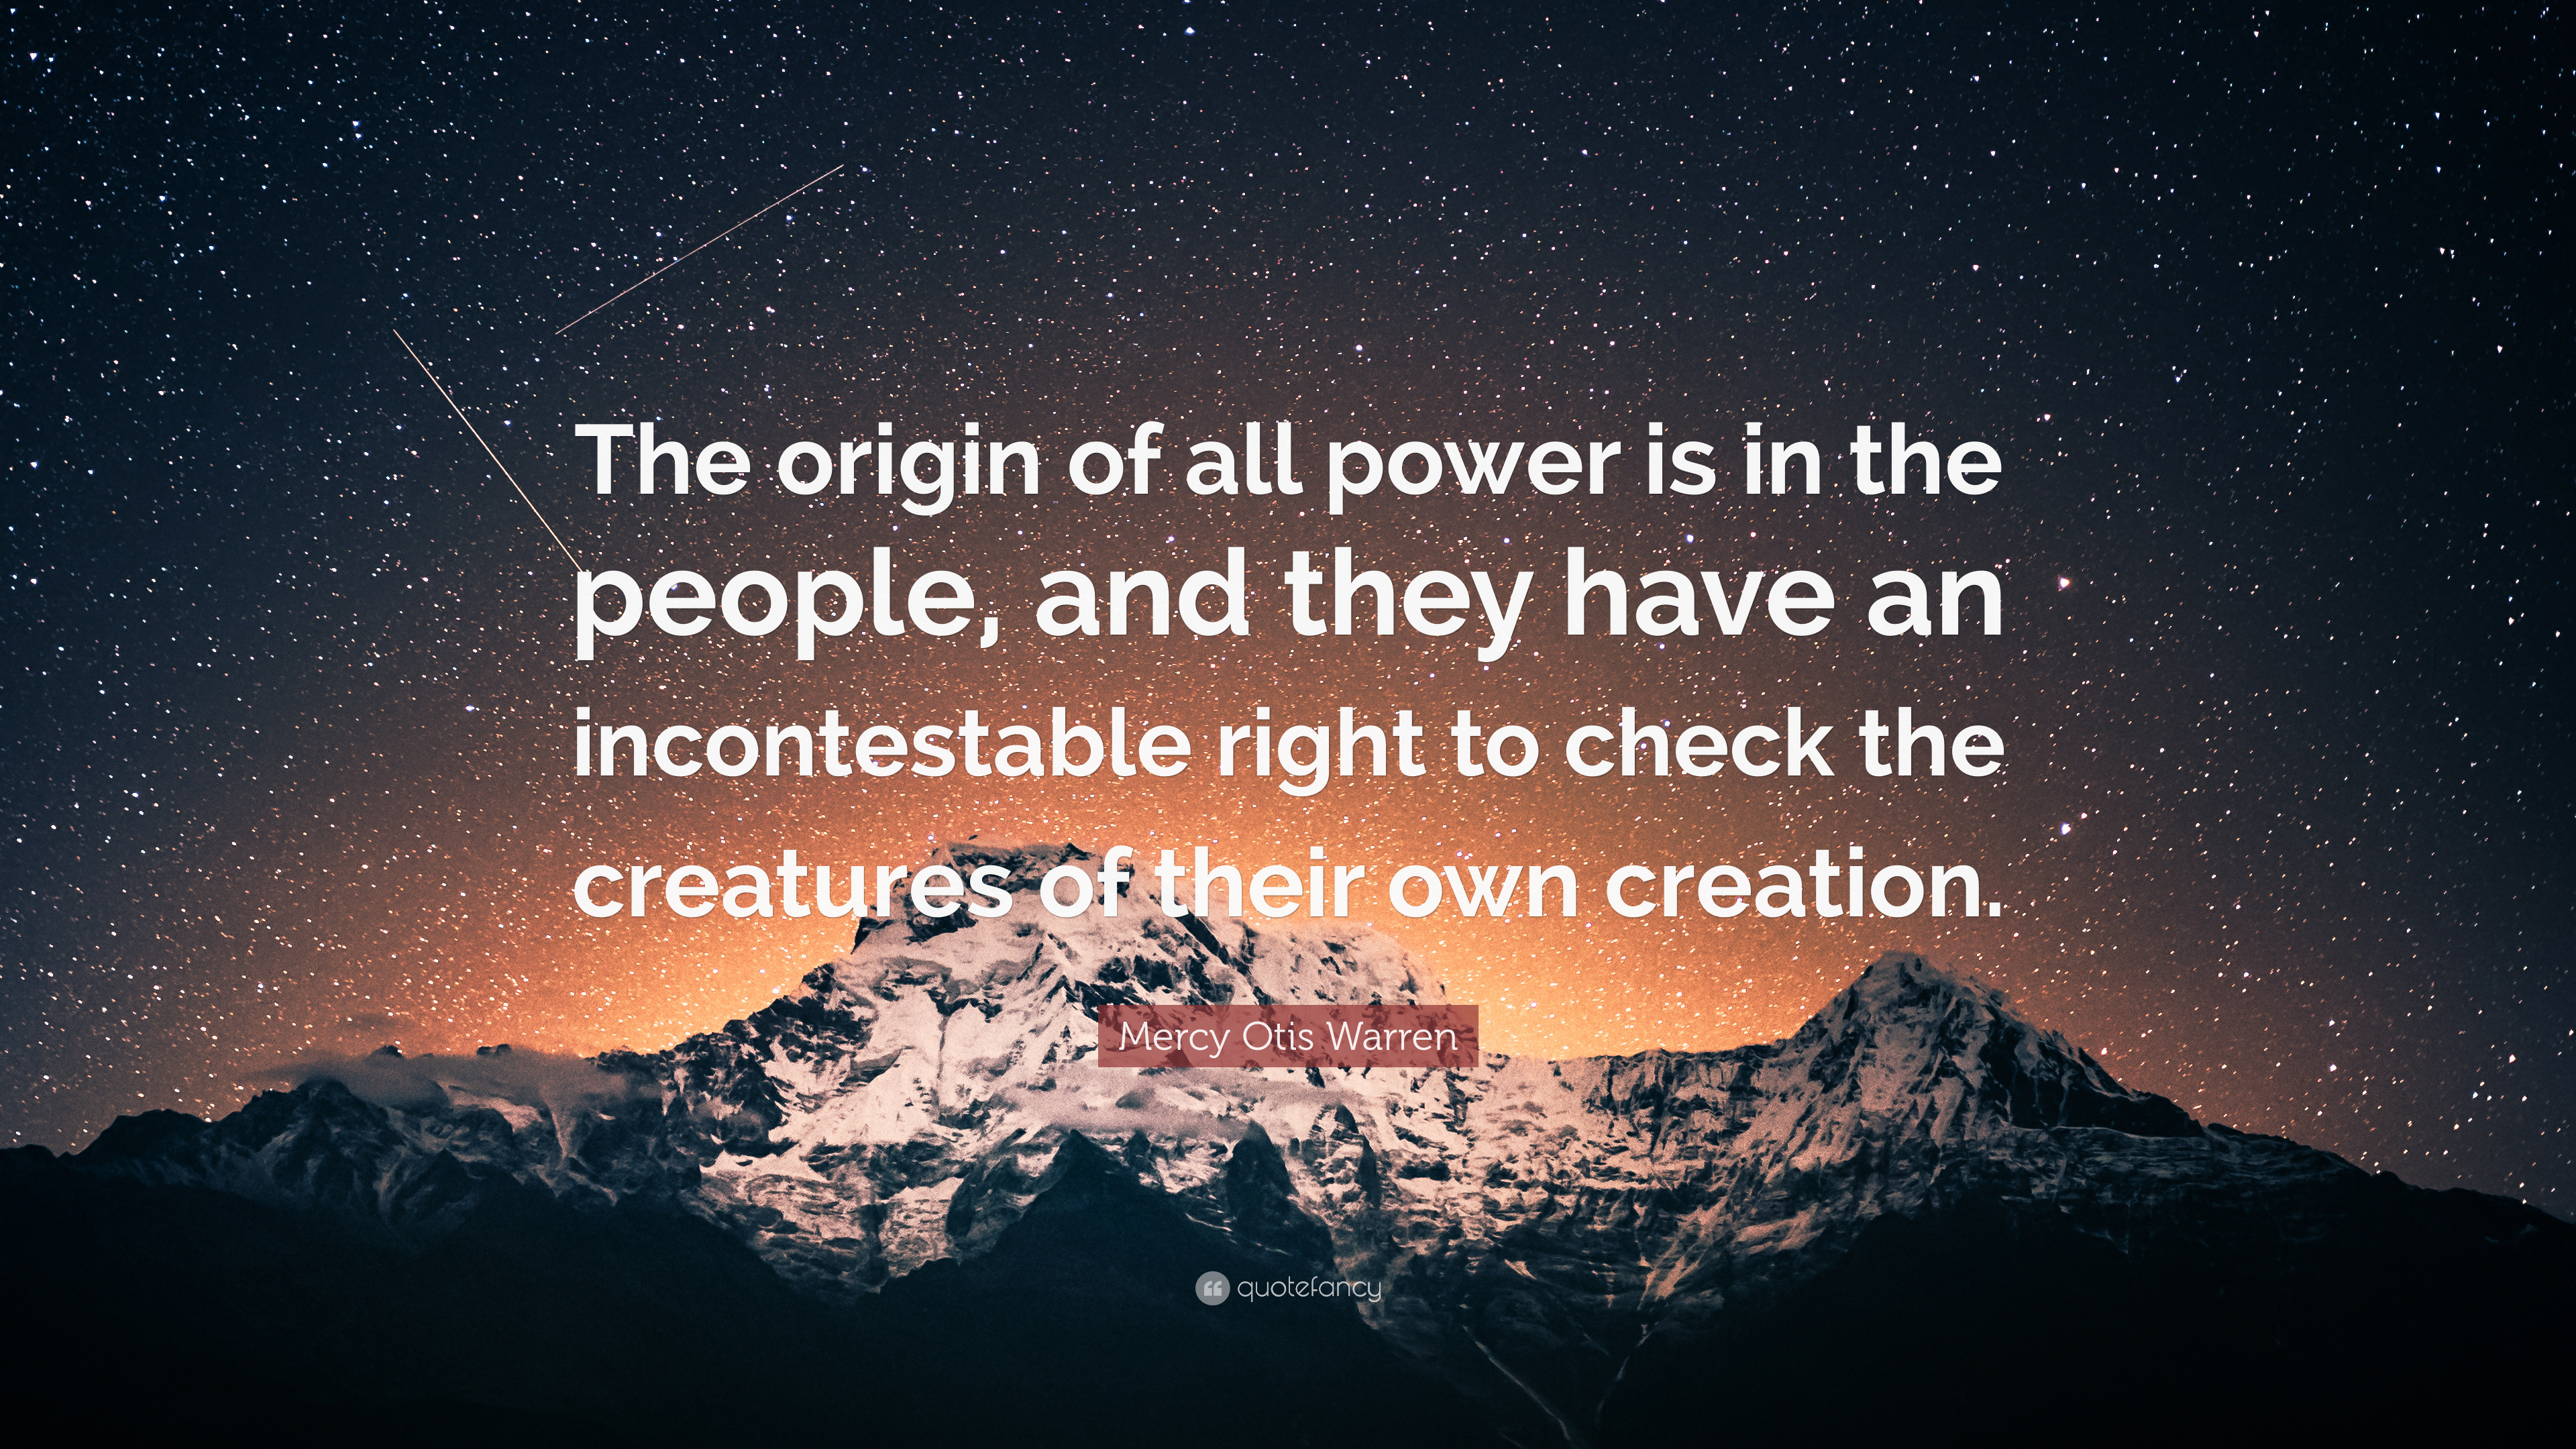 Origins of Power